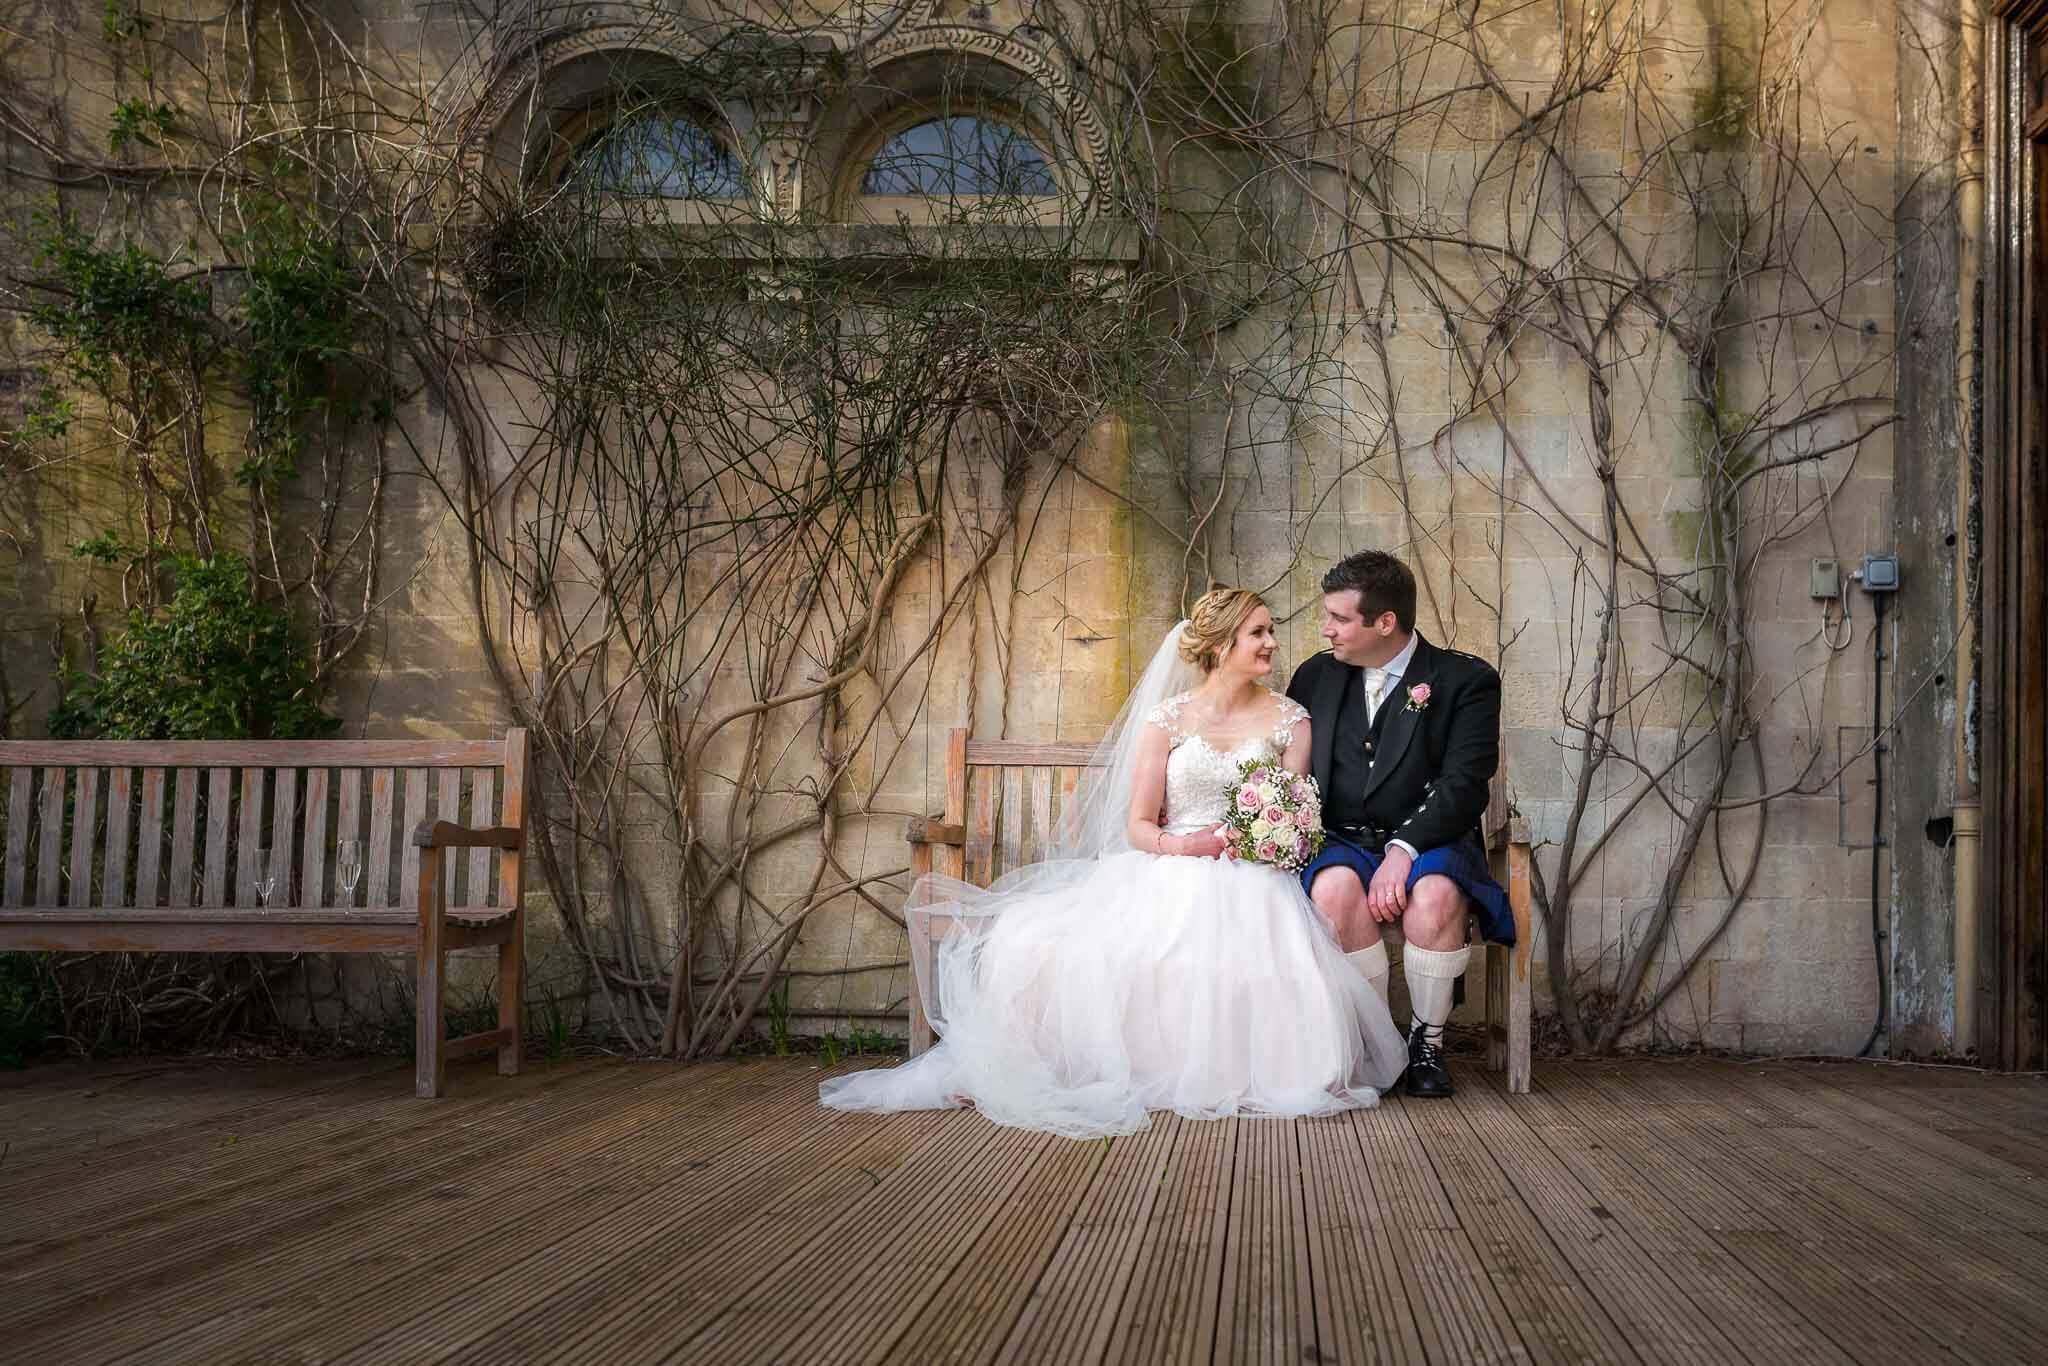 Somerset Wedding Photographer, Orchardleigh Estate Wedding Photography, Wedding couple in sunlight